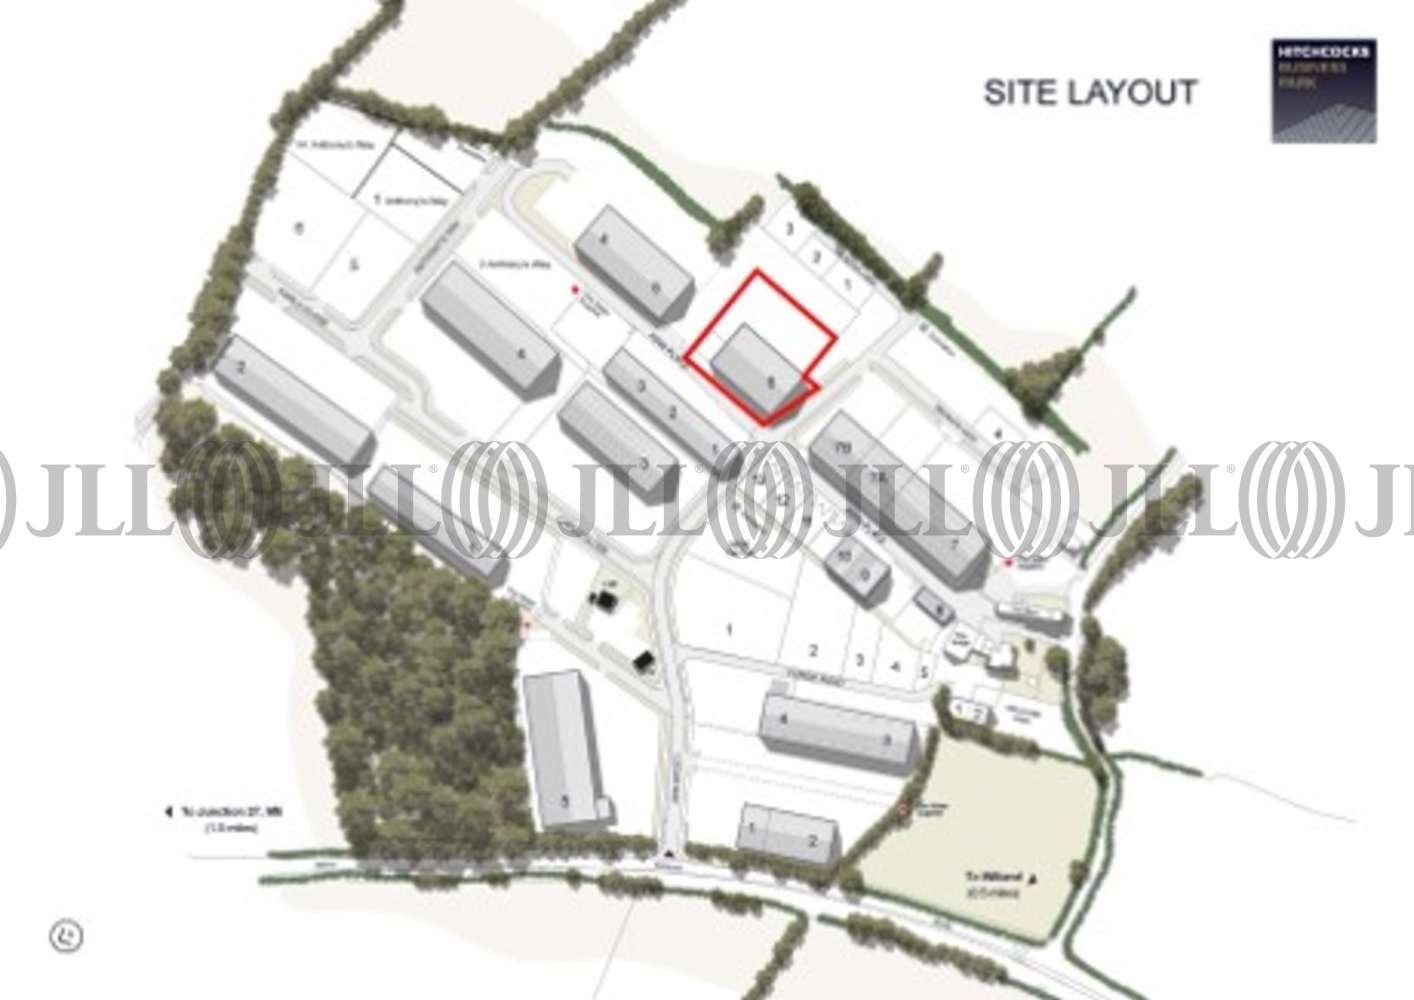 Industrial Cullompton, uffculme, hitchcocks business park, EX15 3FA - Unit 6